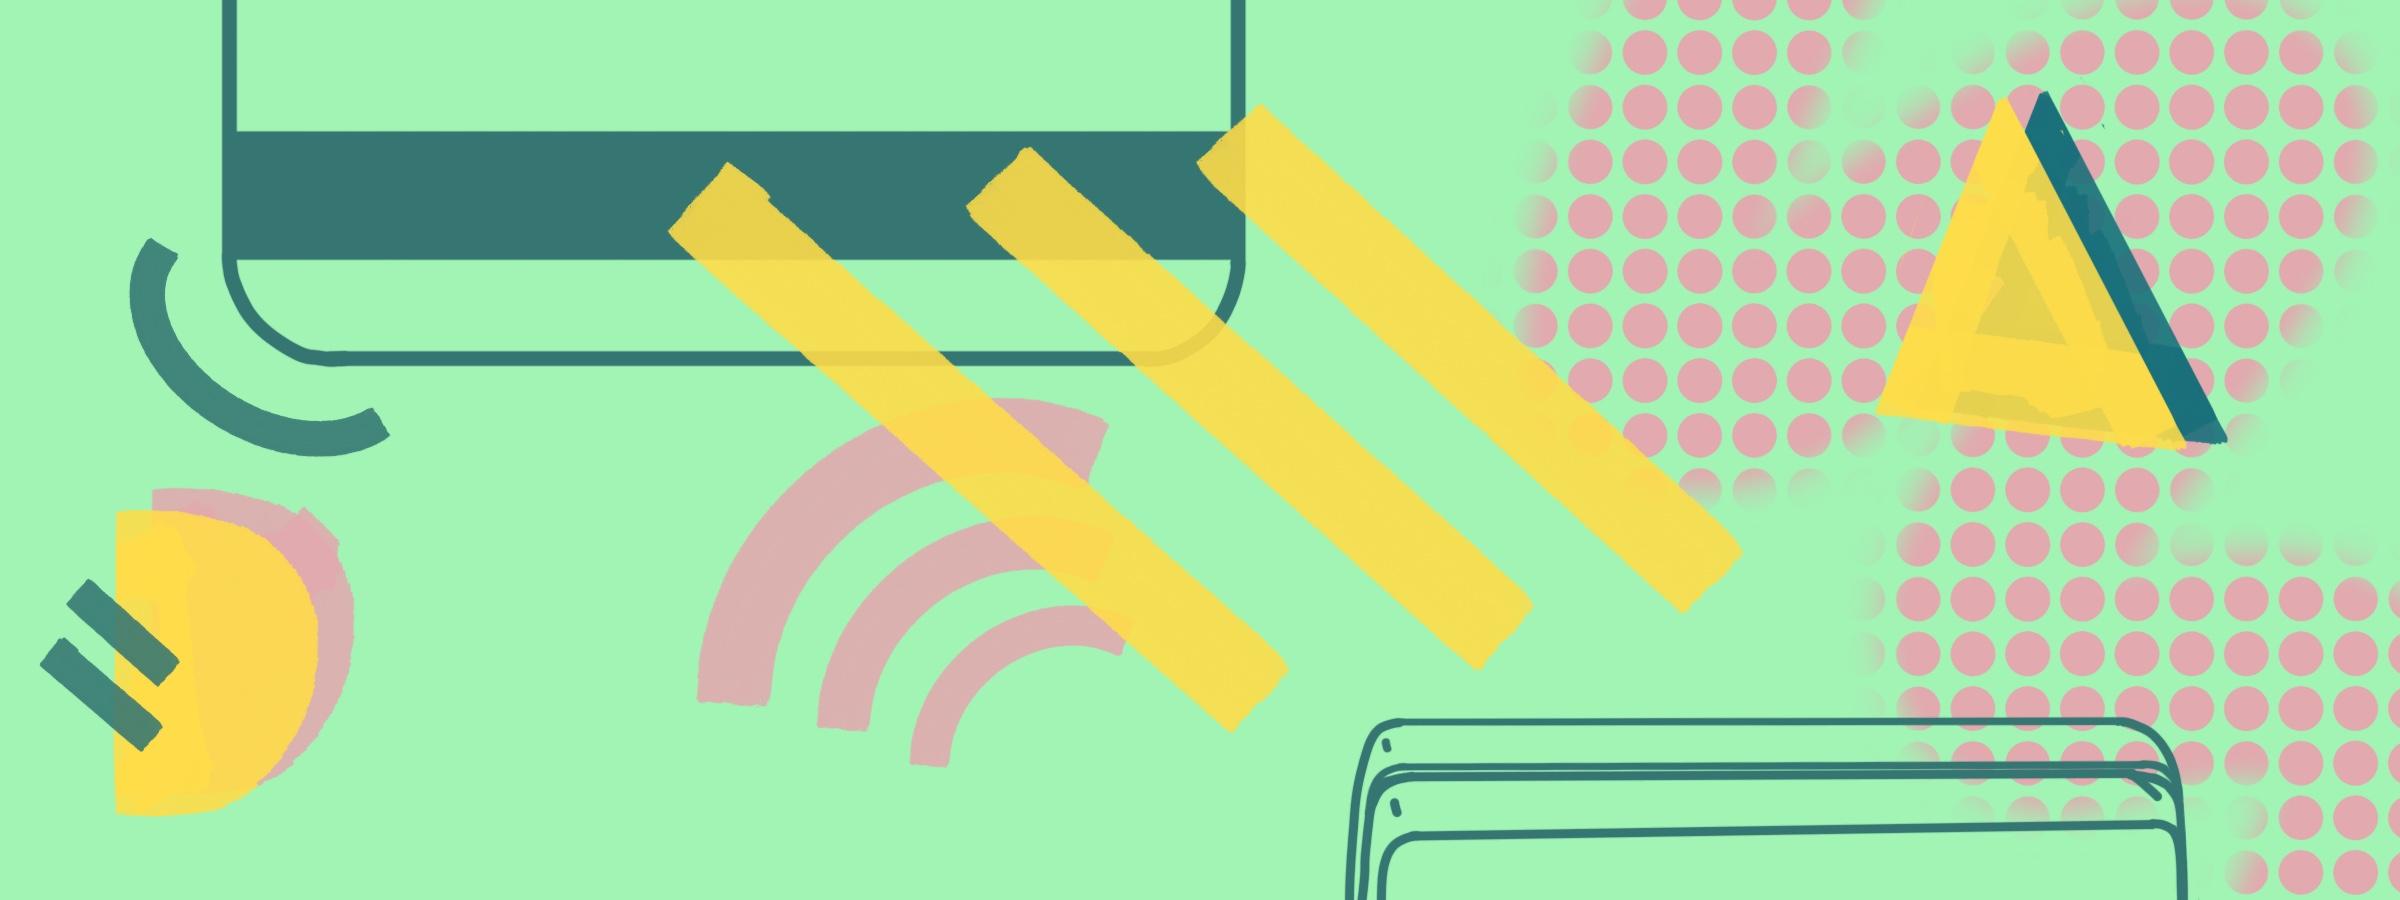 Tito x Stripe Transactions Header Image